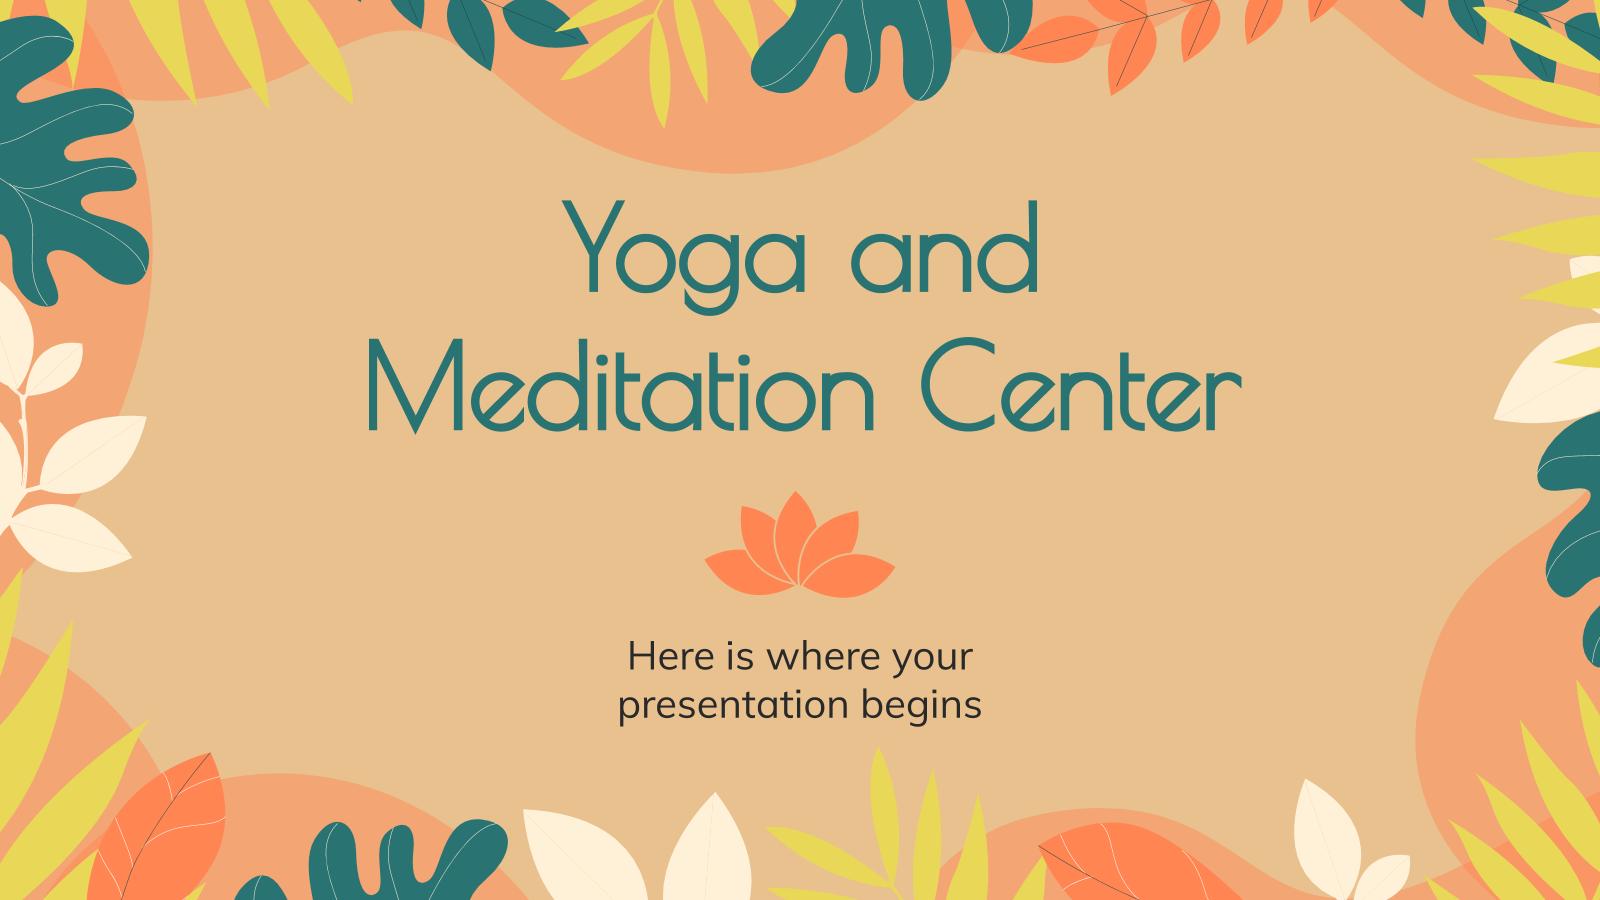 Yoga and Meditation Center presentation template